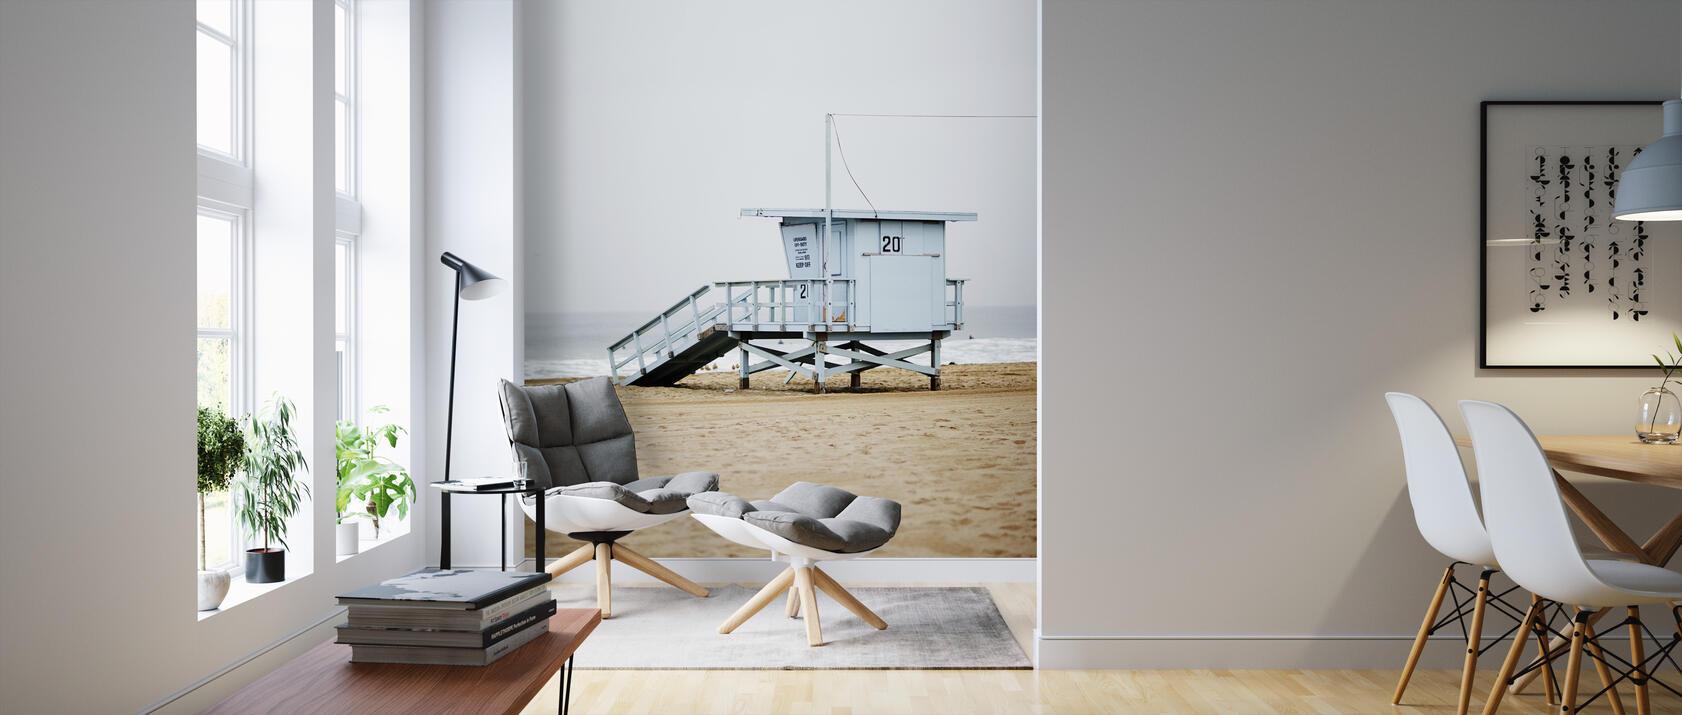 santa monica los angeles beliebte fototapete photowall. Black Bedroom Furniture Sets. Home Design Ideas